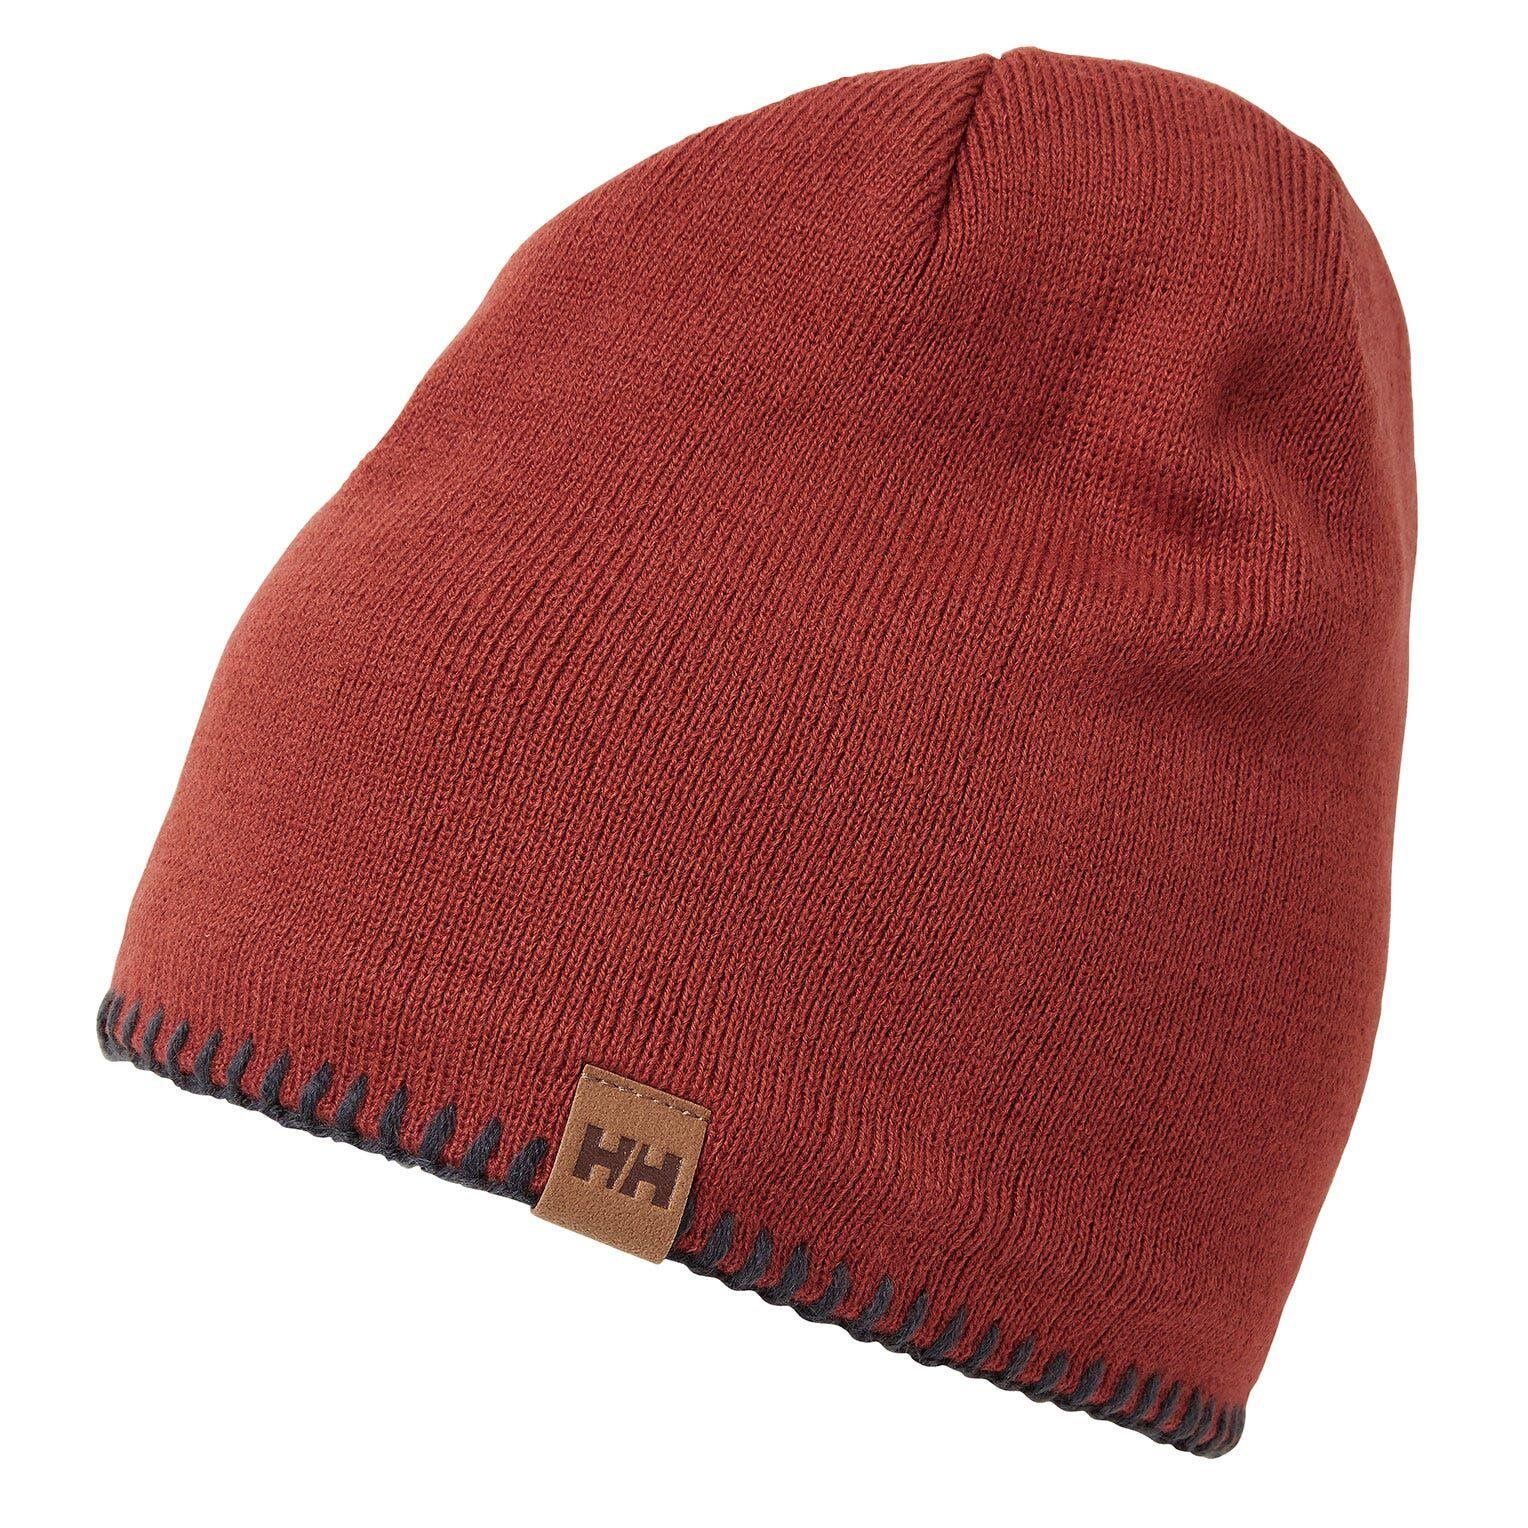 Helly Hansen Mountain Beanie Fleece Lined Red STD